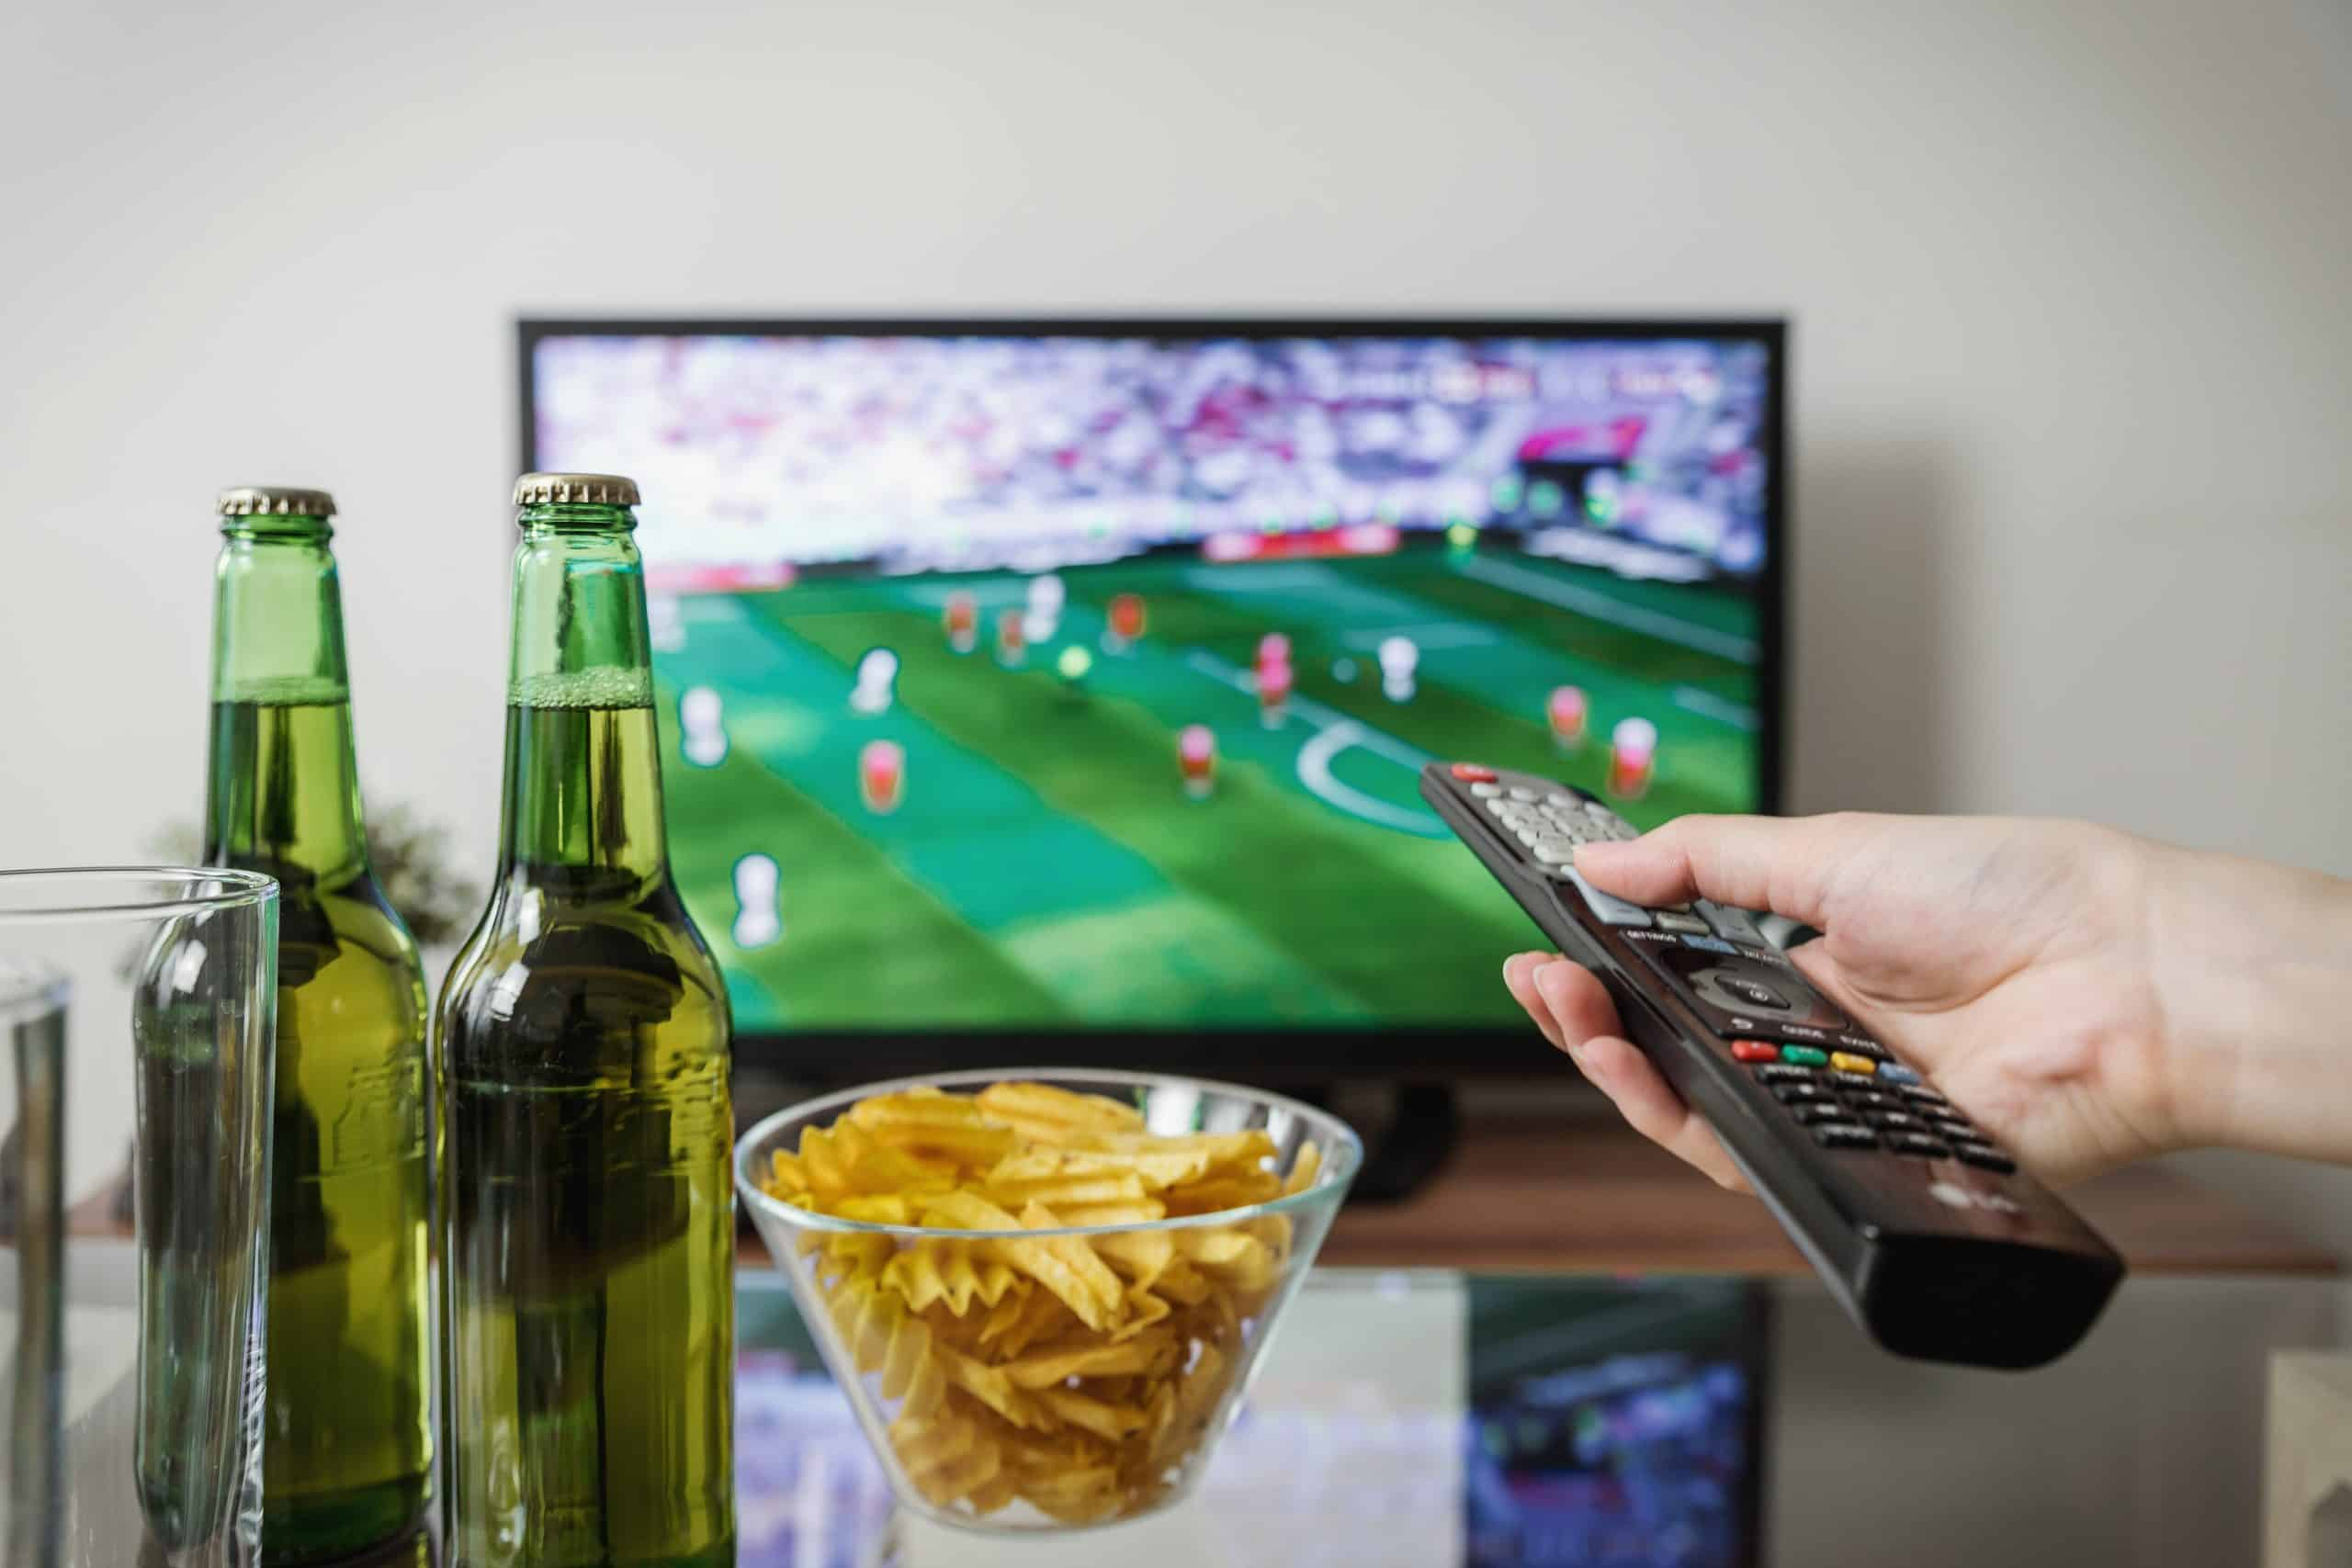 3 Reasons The Groupon Super Bowl Backlash Is Bullshit